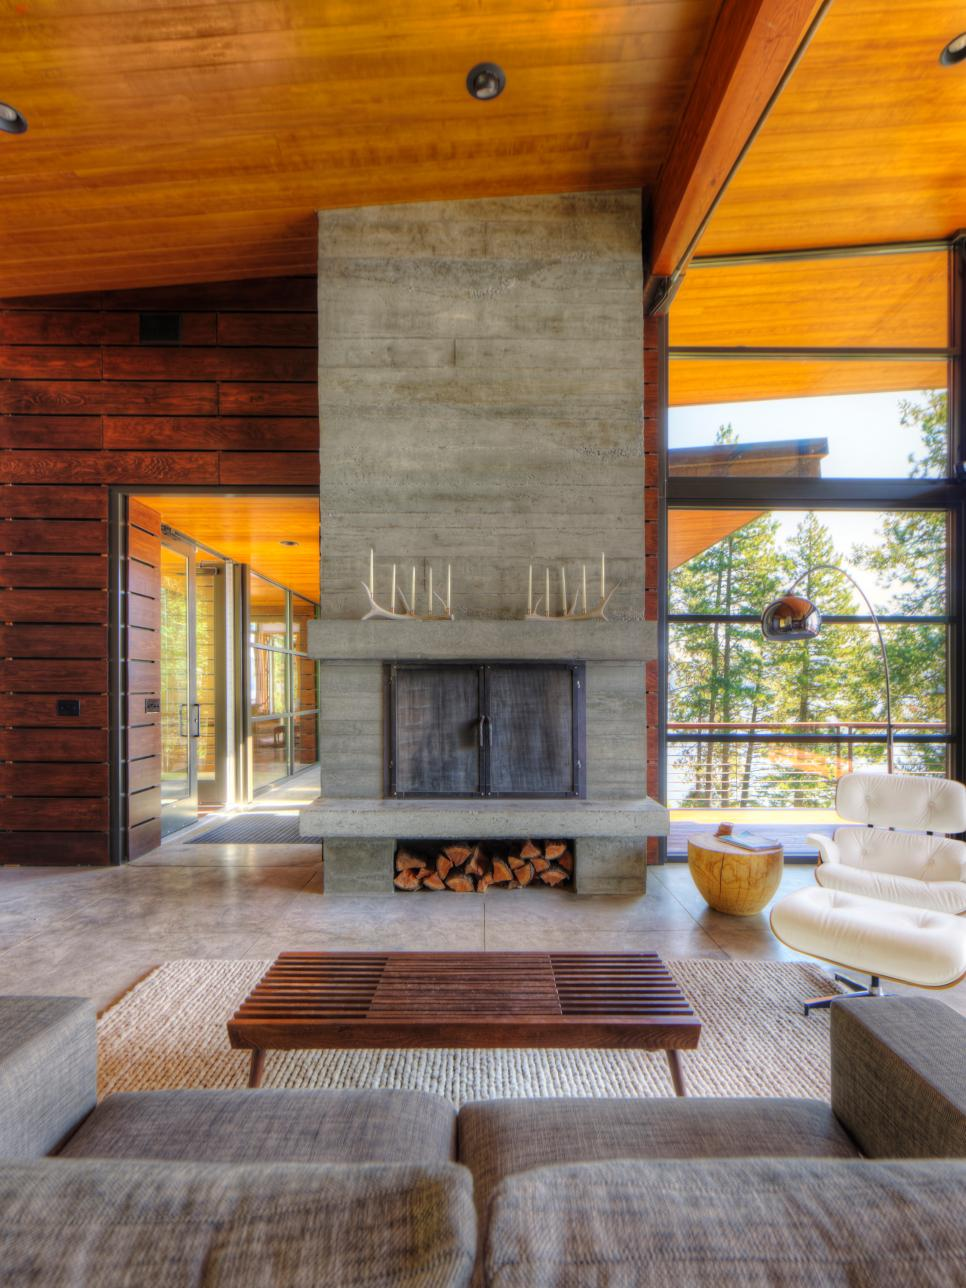 inspirational 17 hot fireplace designshgtv